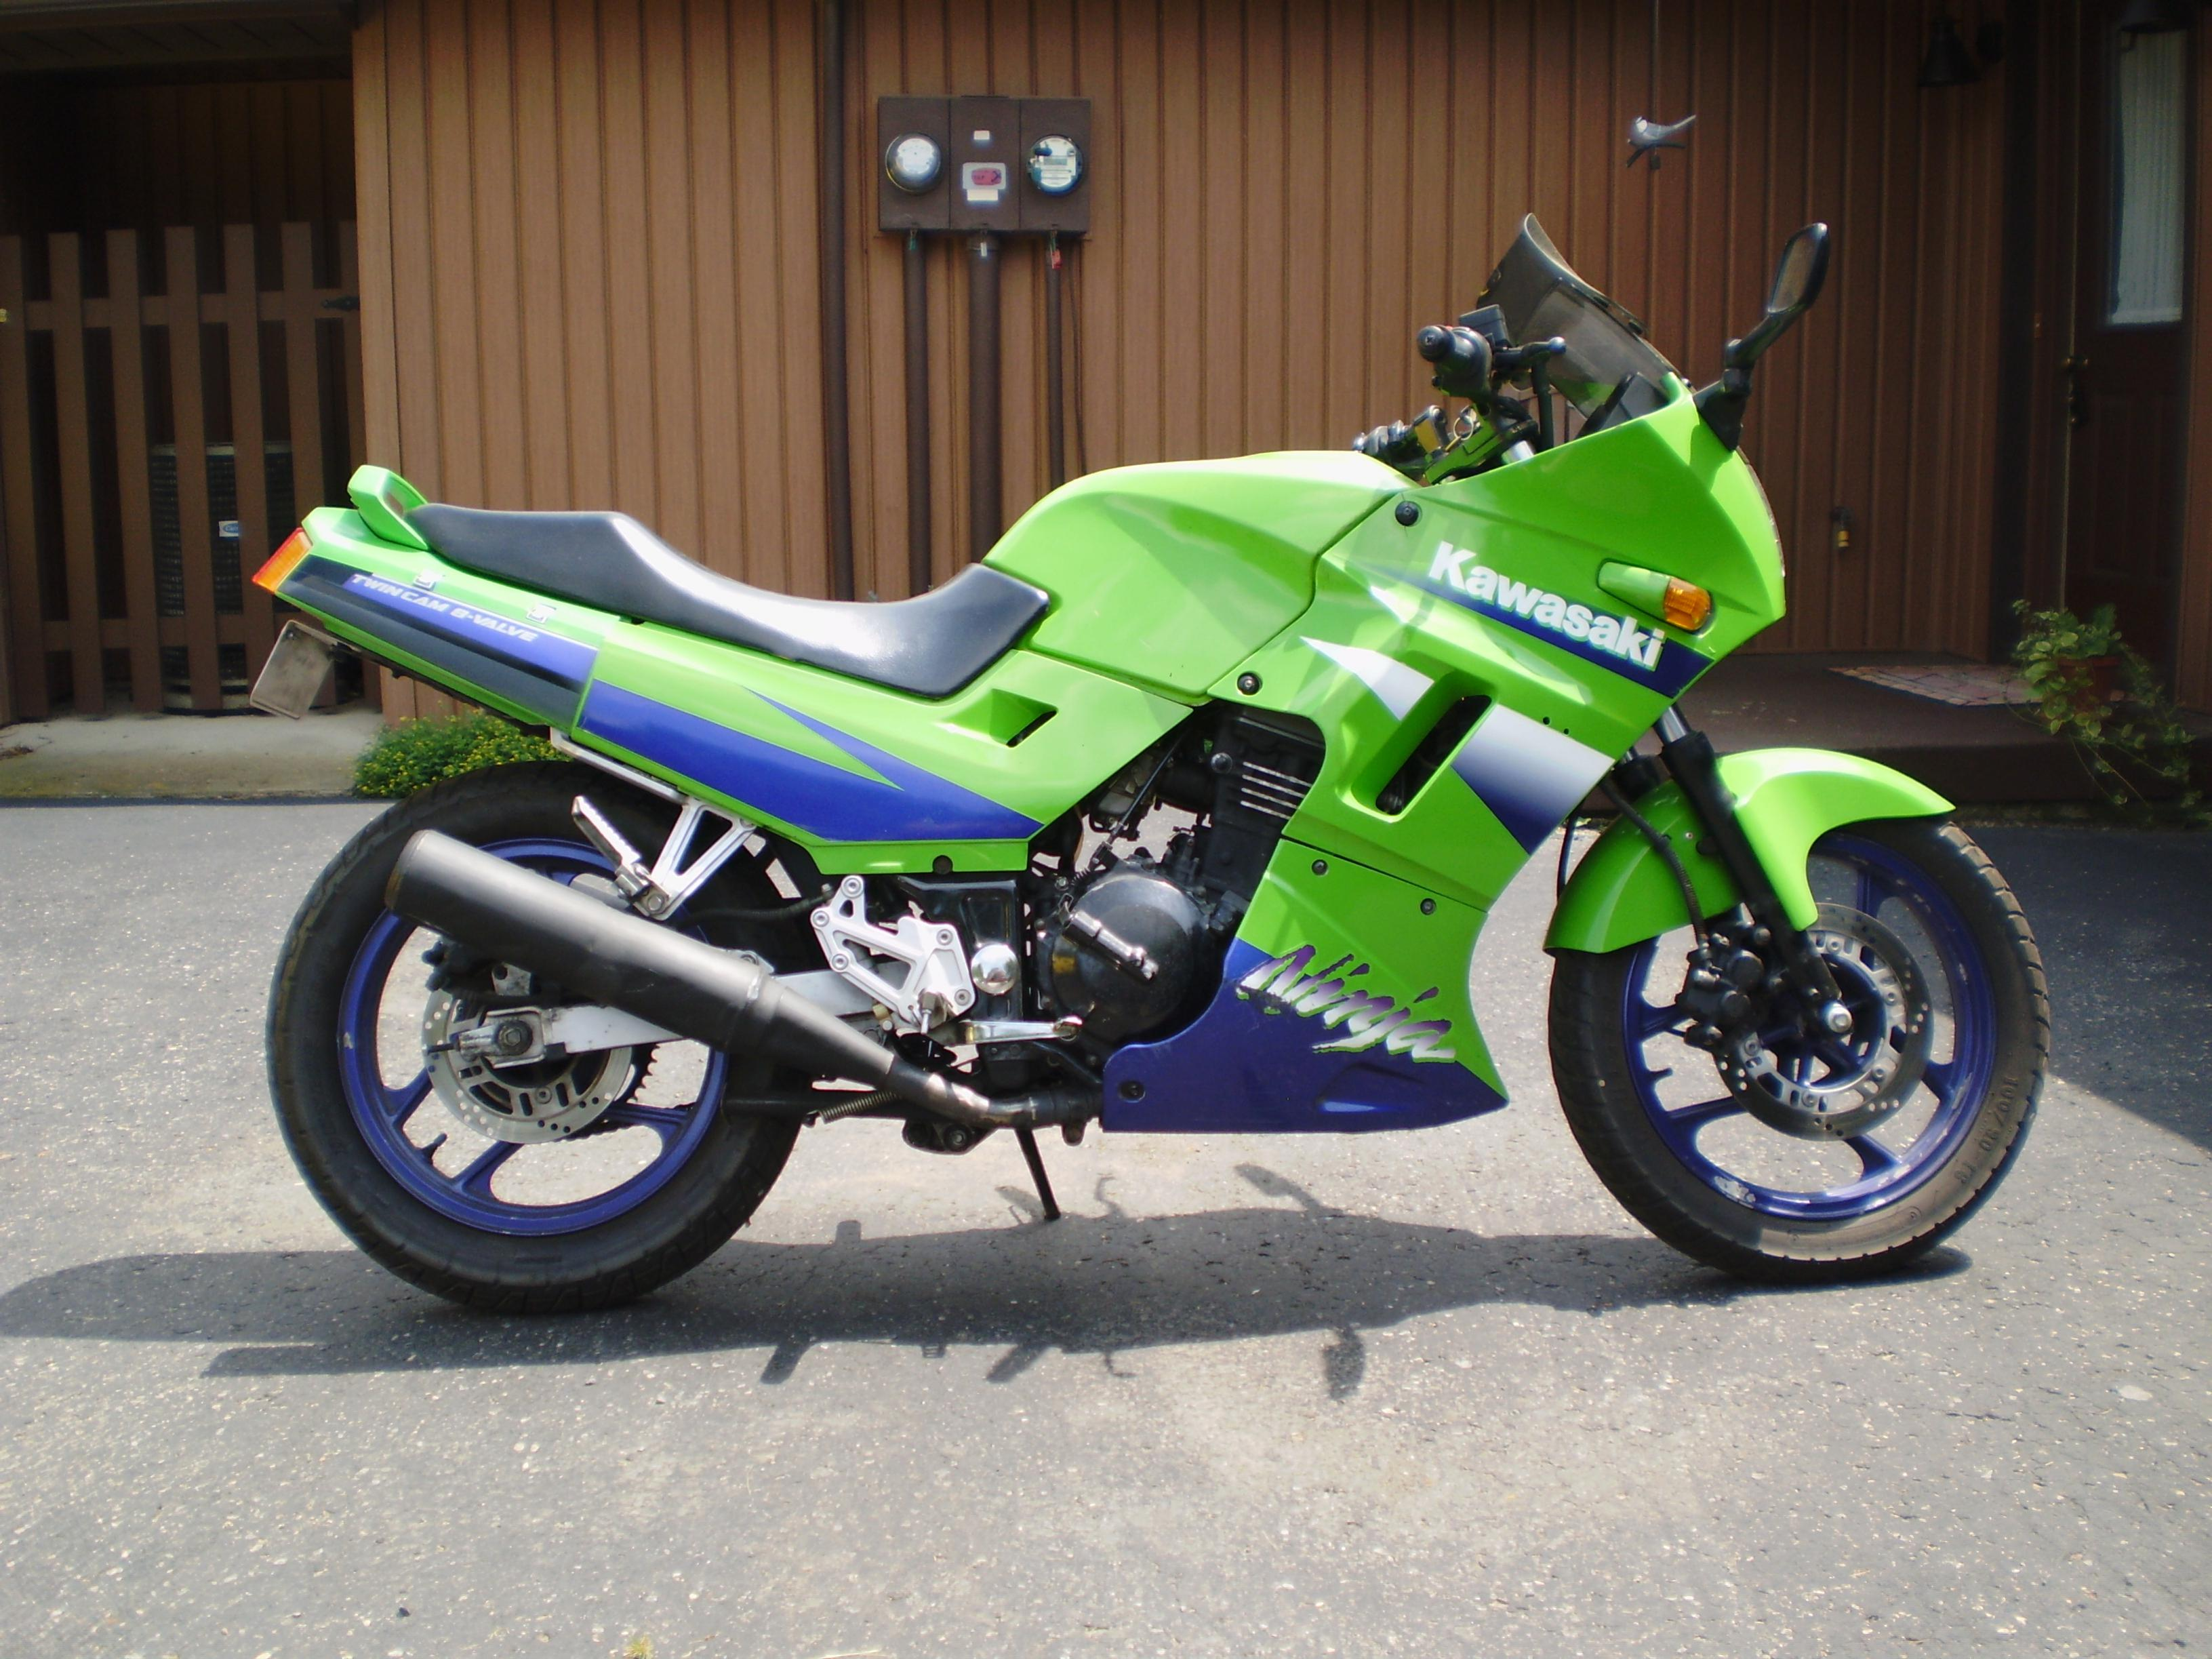 Sold 2000 Kawasaki Ninja 250 1300 Williamsport Pa 500r Wiring Diagram Attached Thumbnails